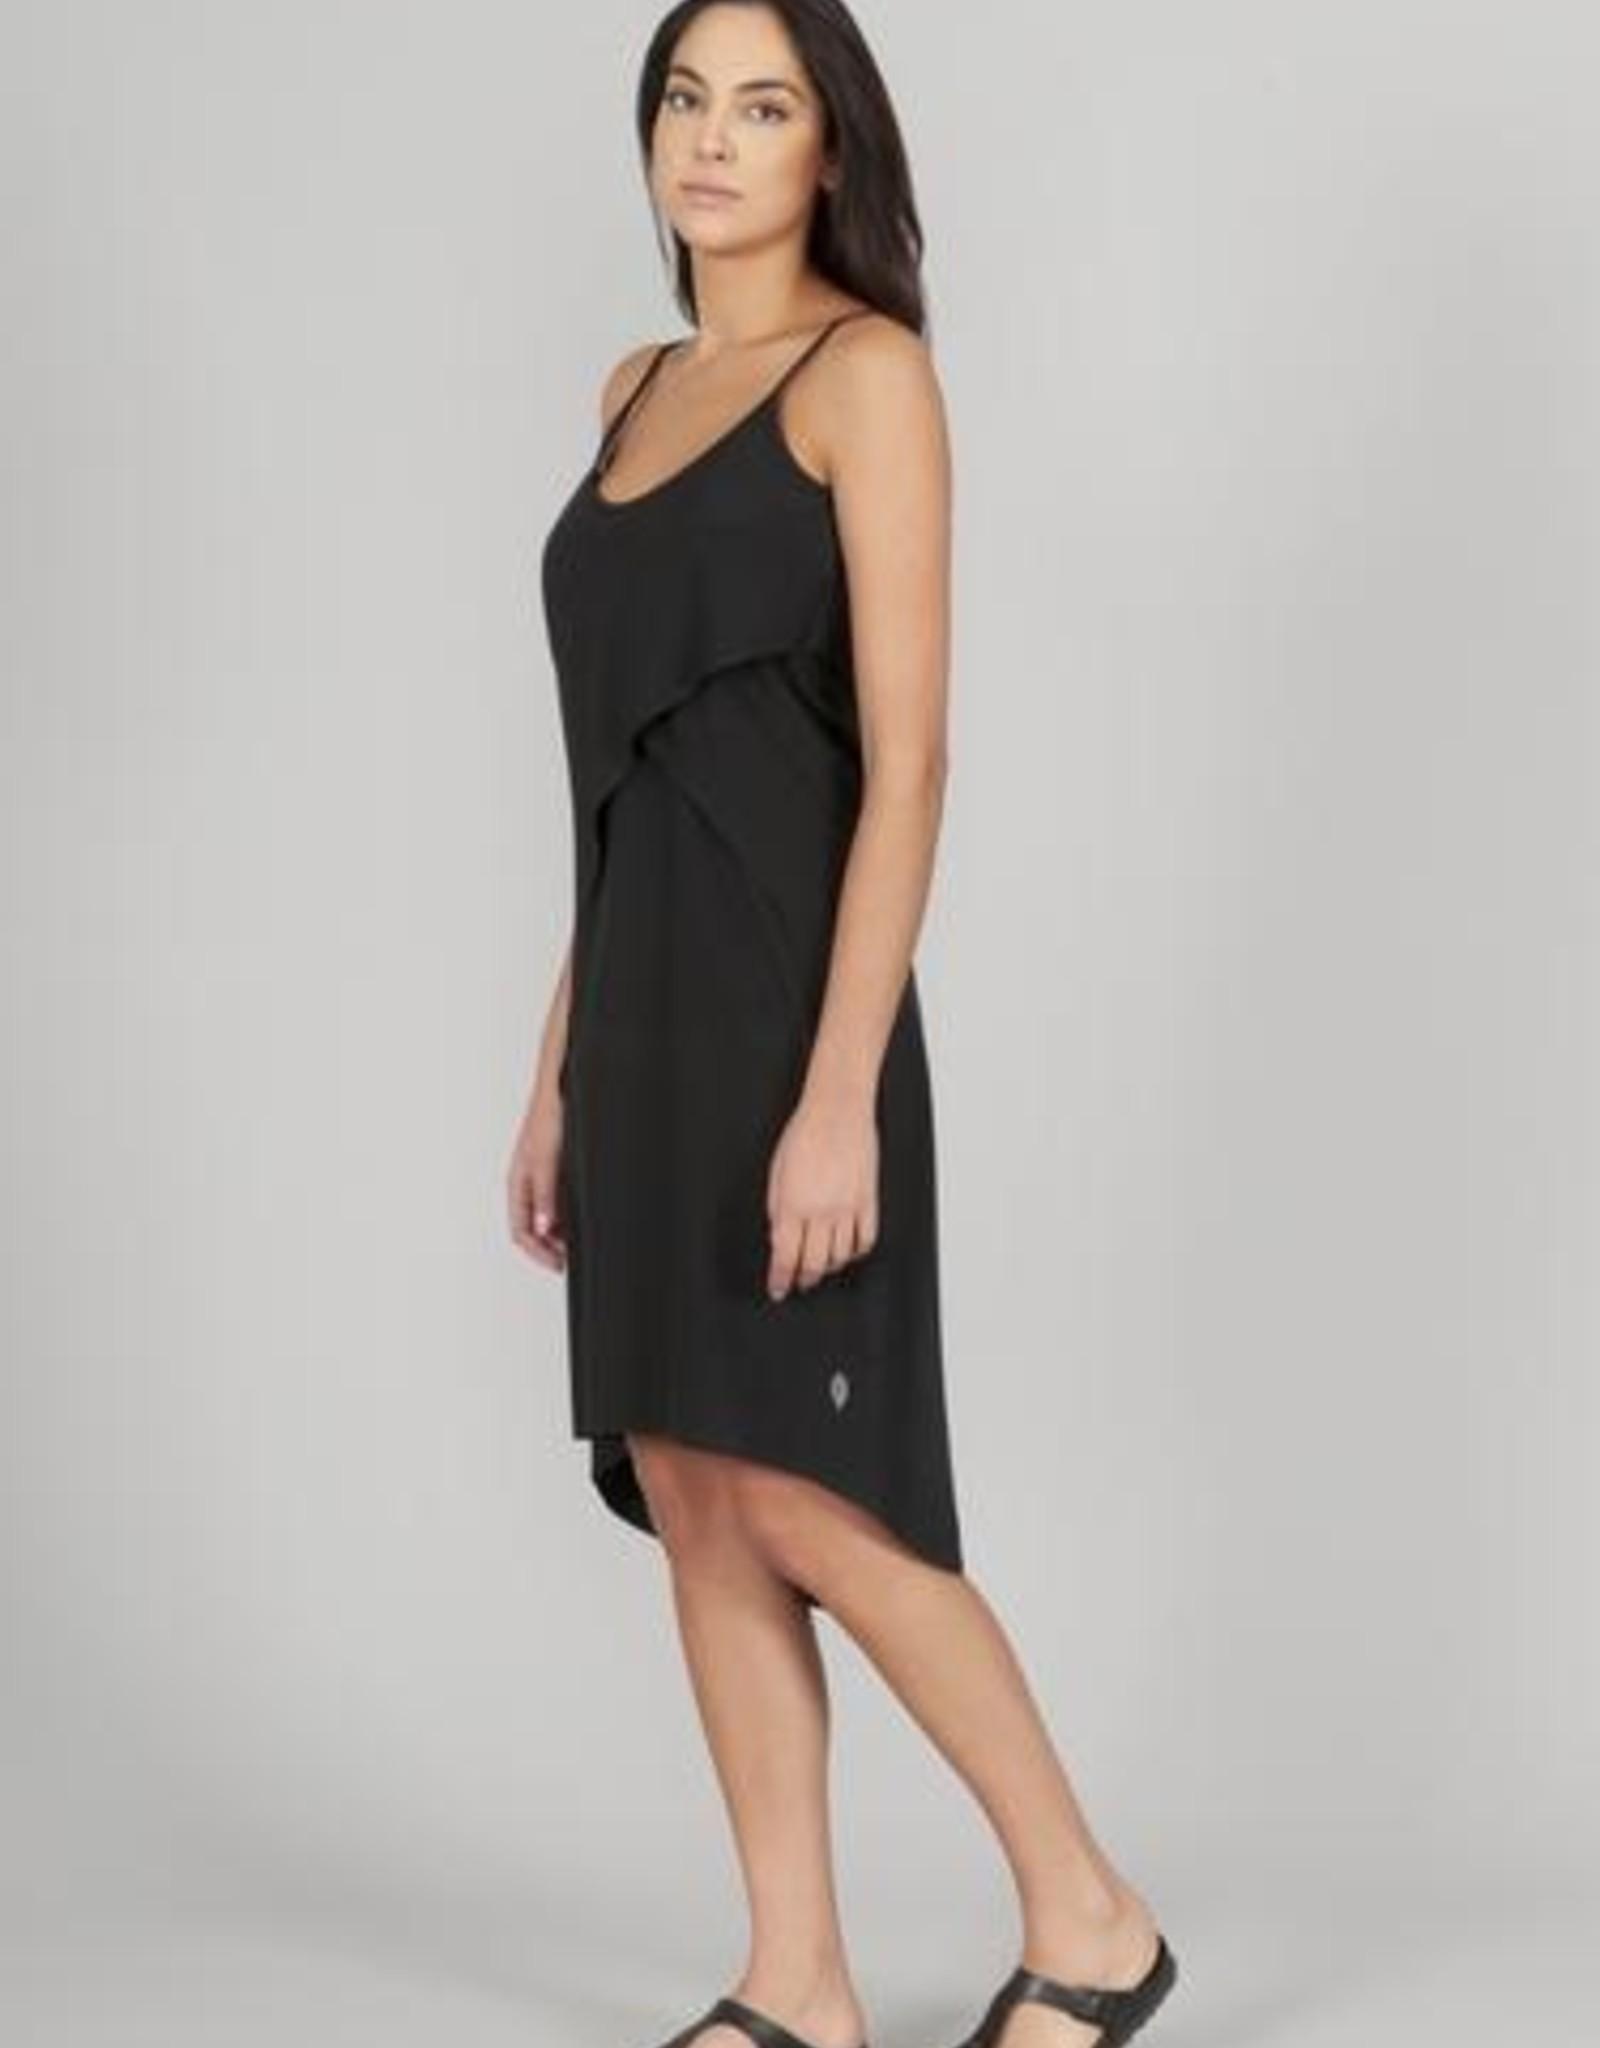 Indygena Aerel dress